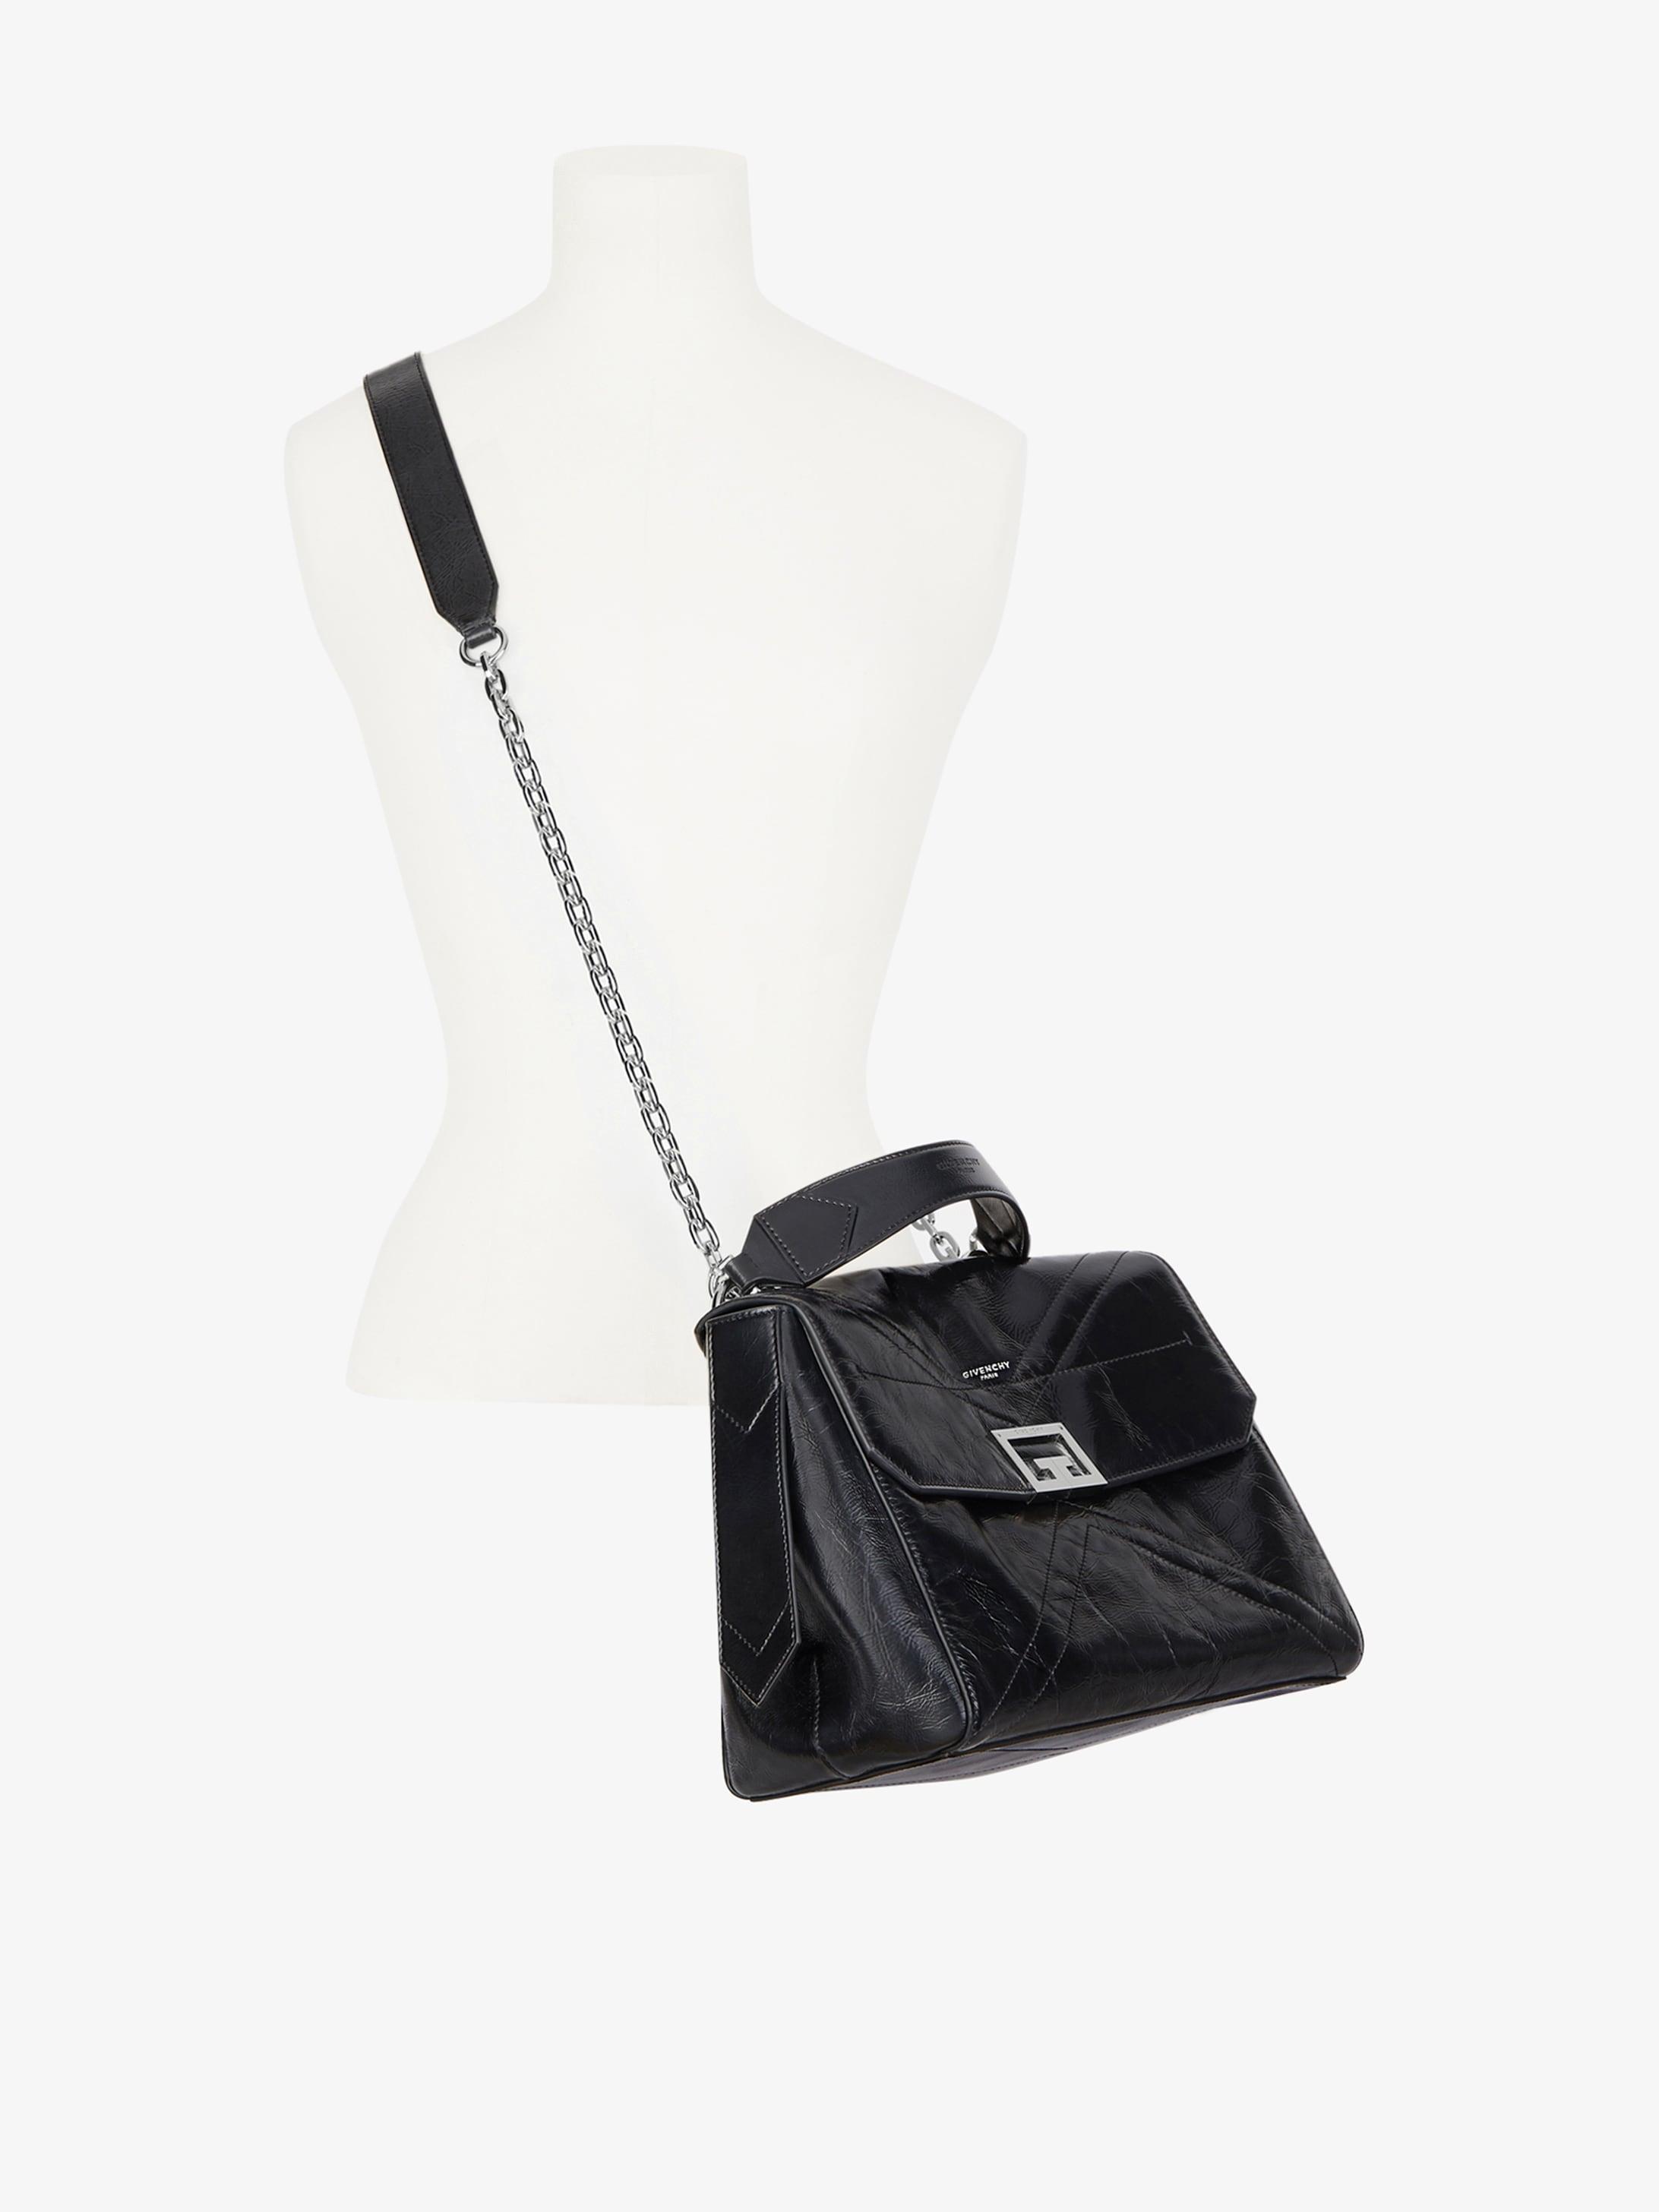 Medium ID bag in aged leather